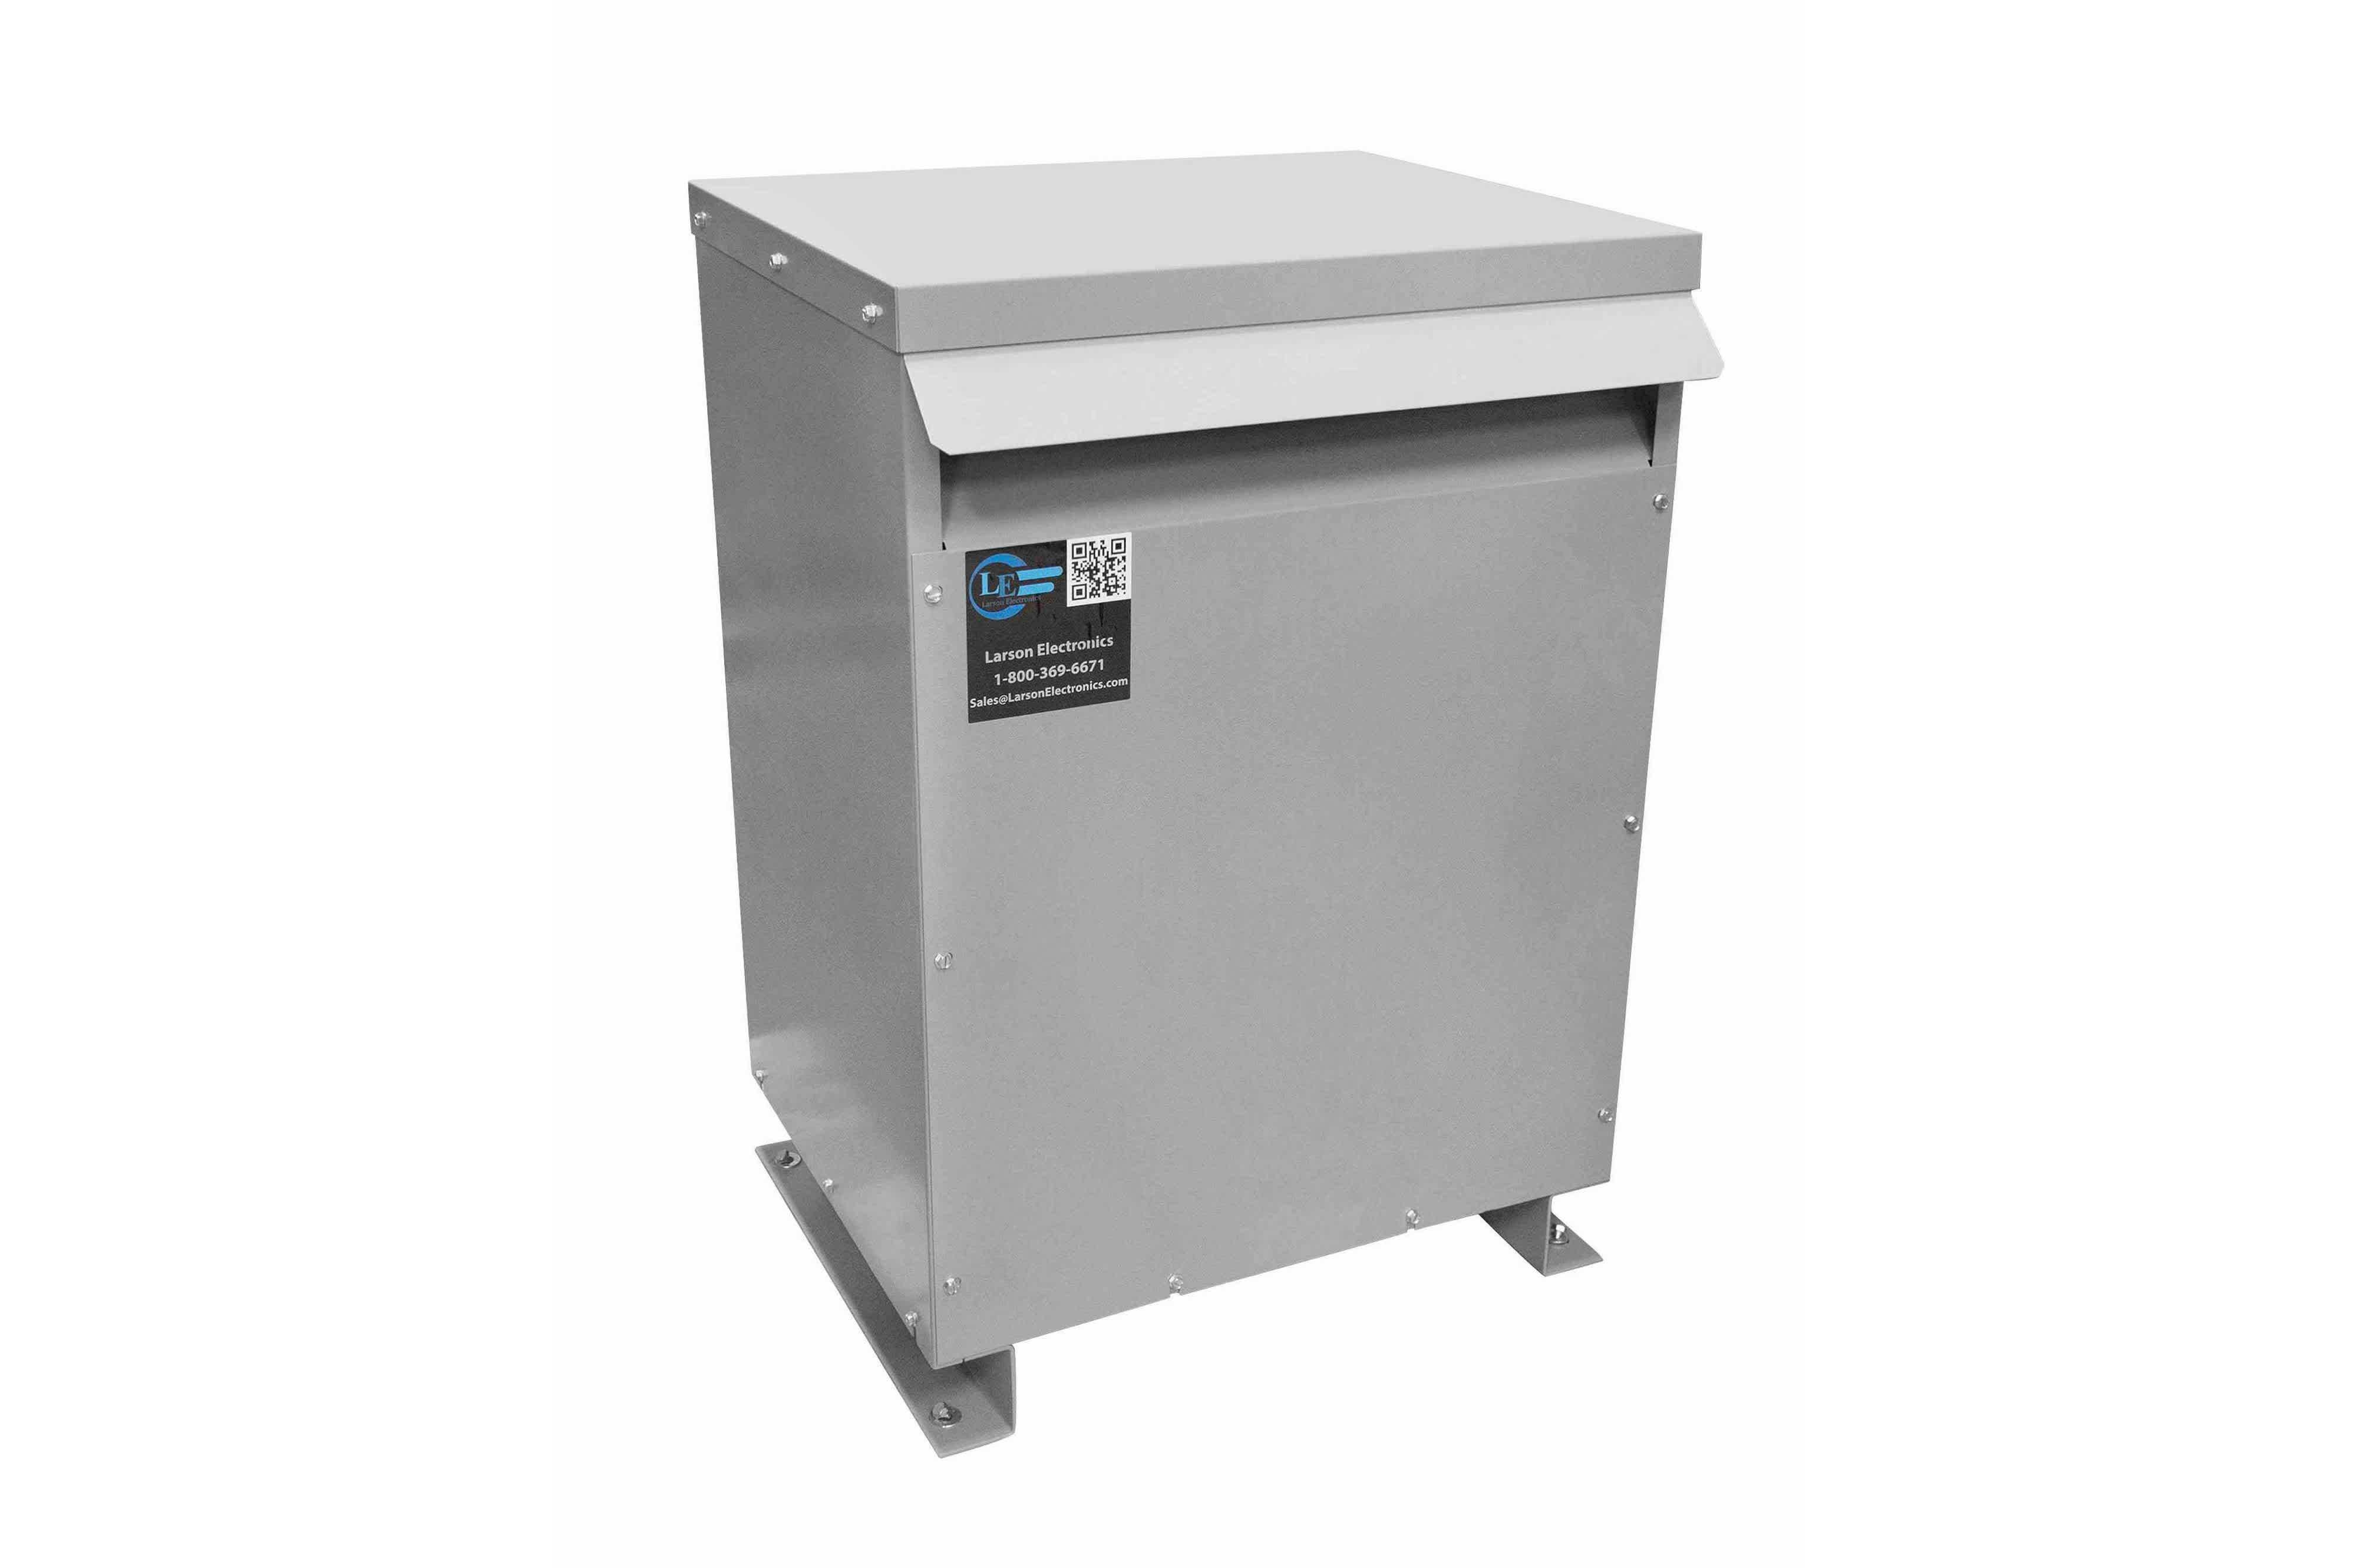 167 kVA 3PH Isolation Transformer, 400V Wye Primary, 480V Delta Secondary, N3R, Ventilated, 60 Hz